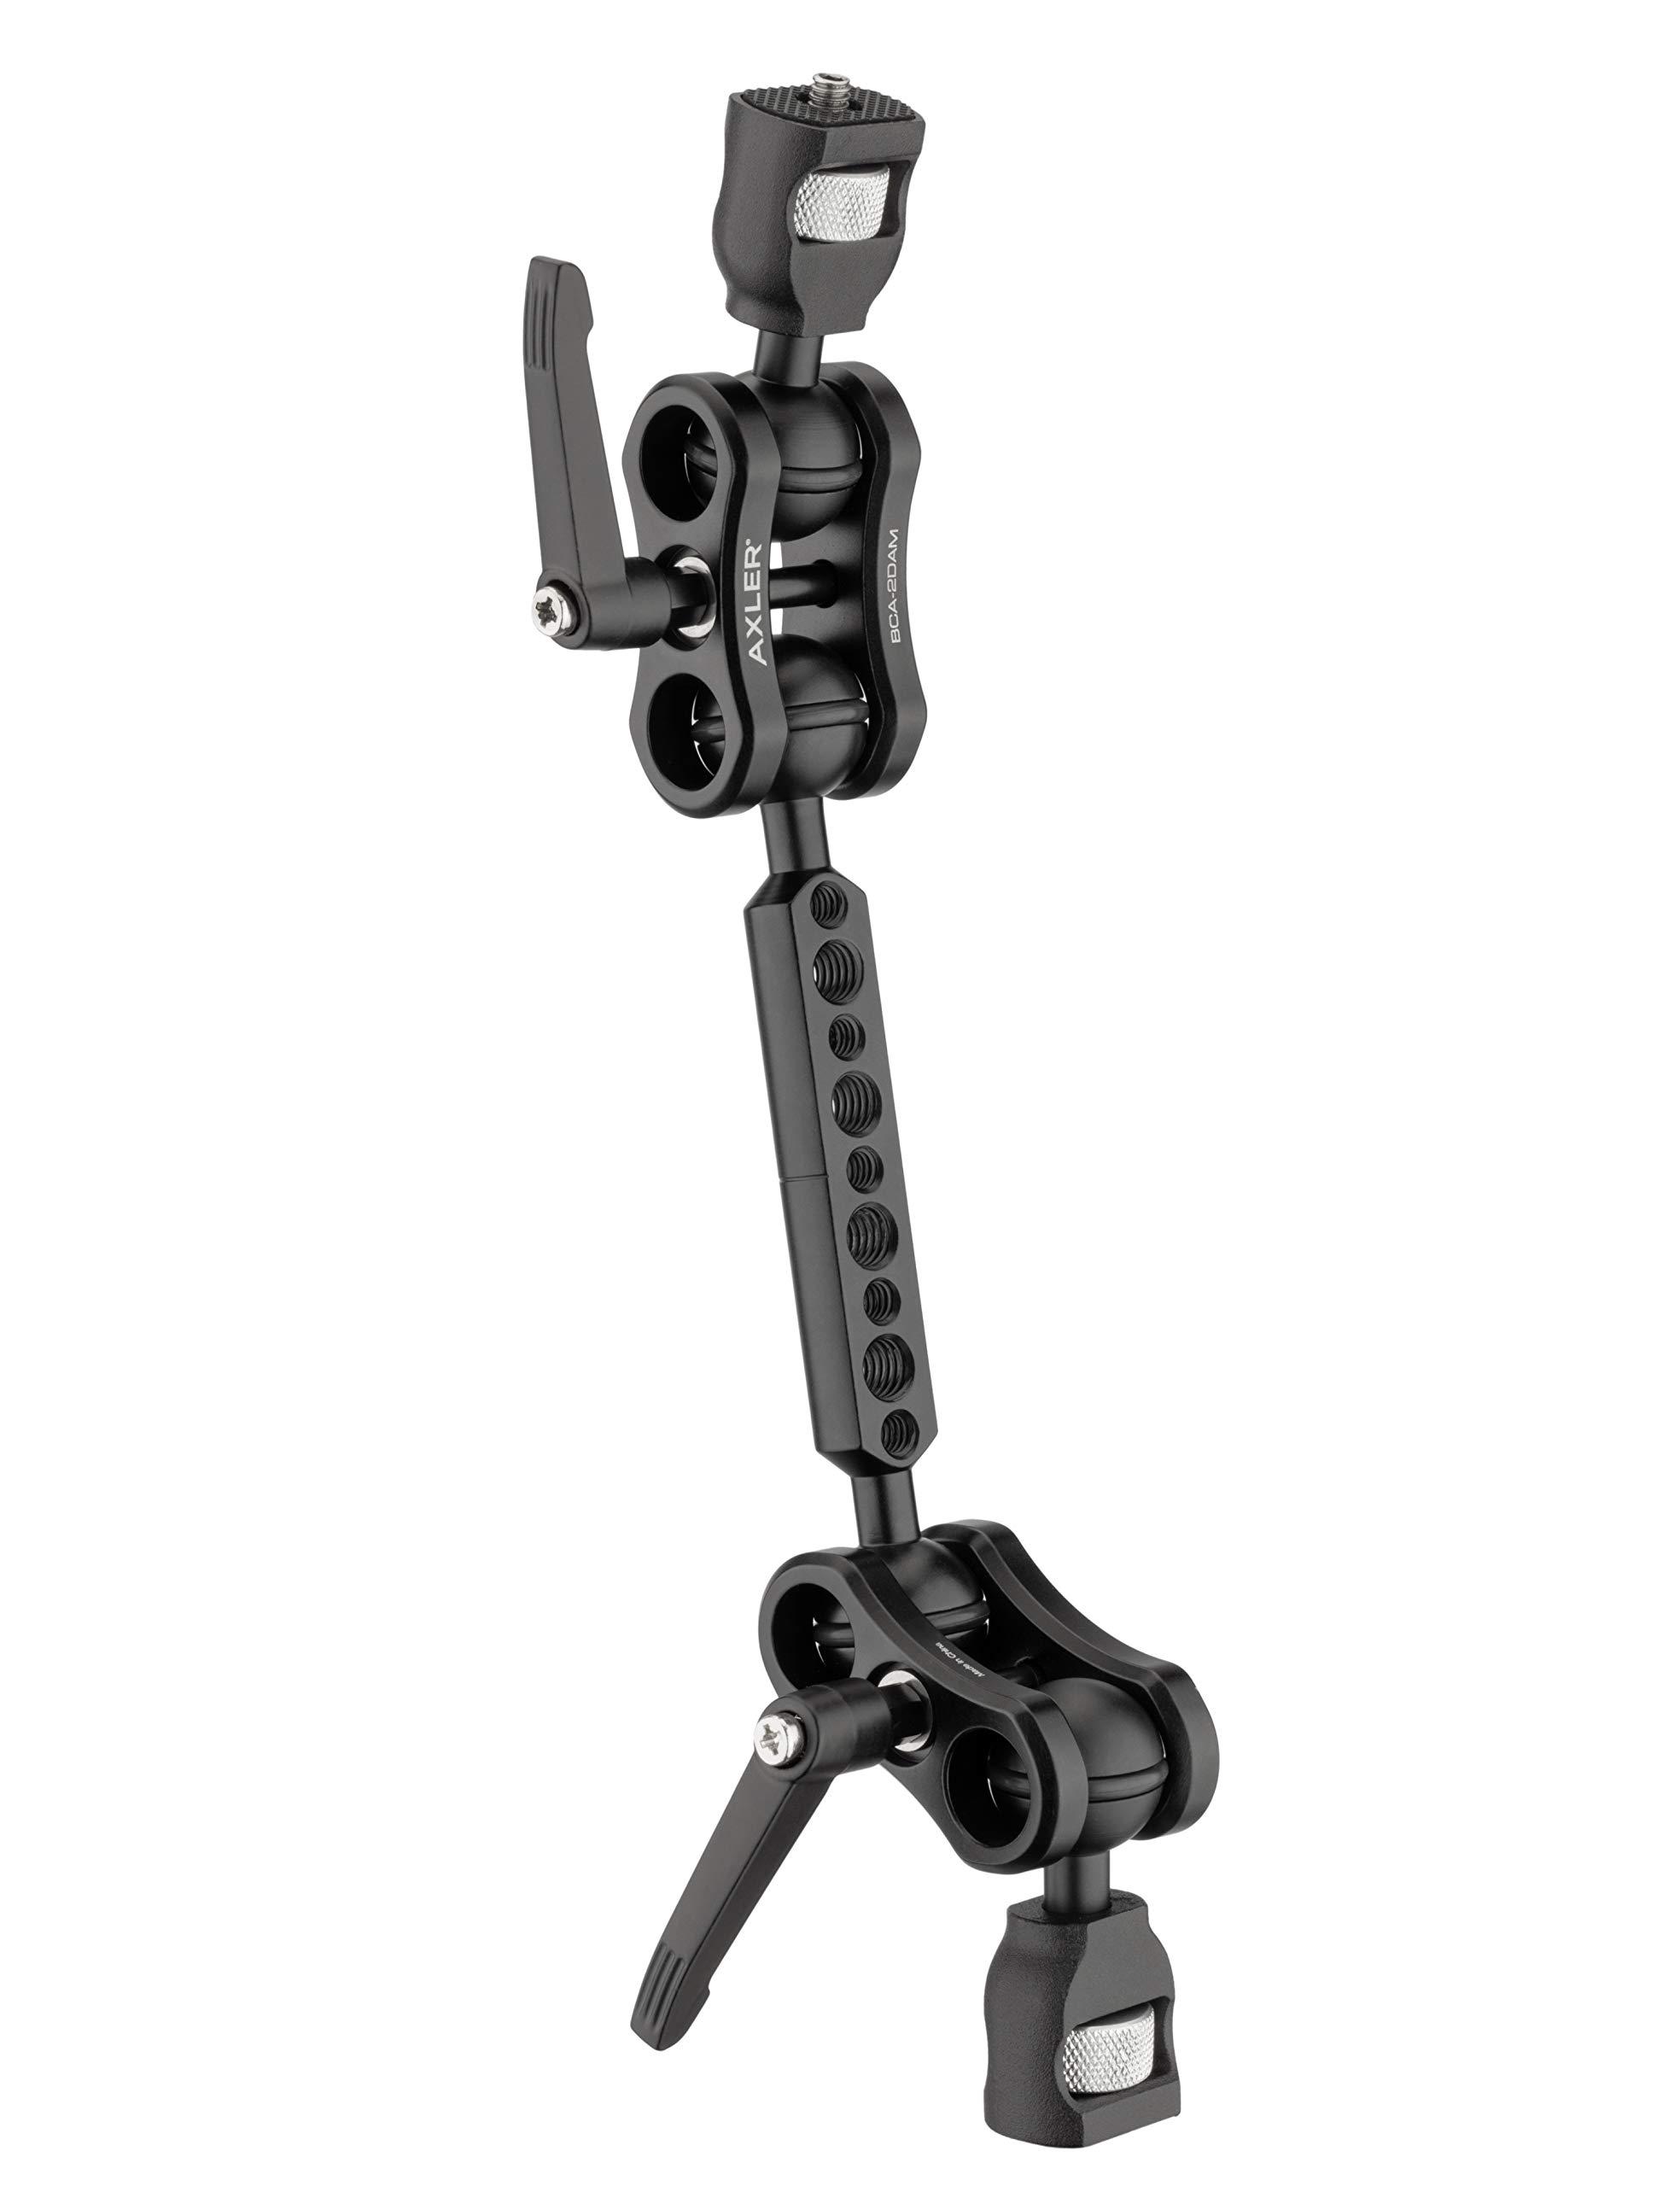 Axler 12'' Dual Mega Ball Clamp Arm with 1/4''-20 and 3/8''-16 ARRI Accessory Mount by Axler